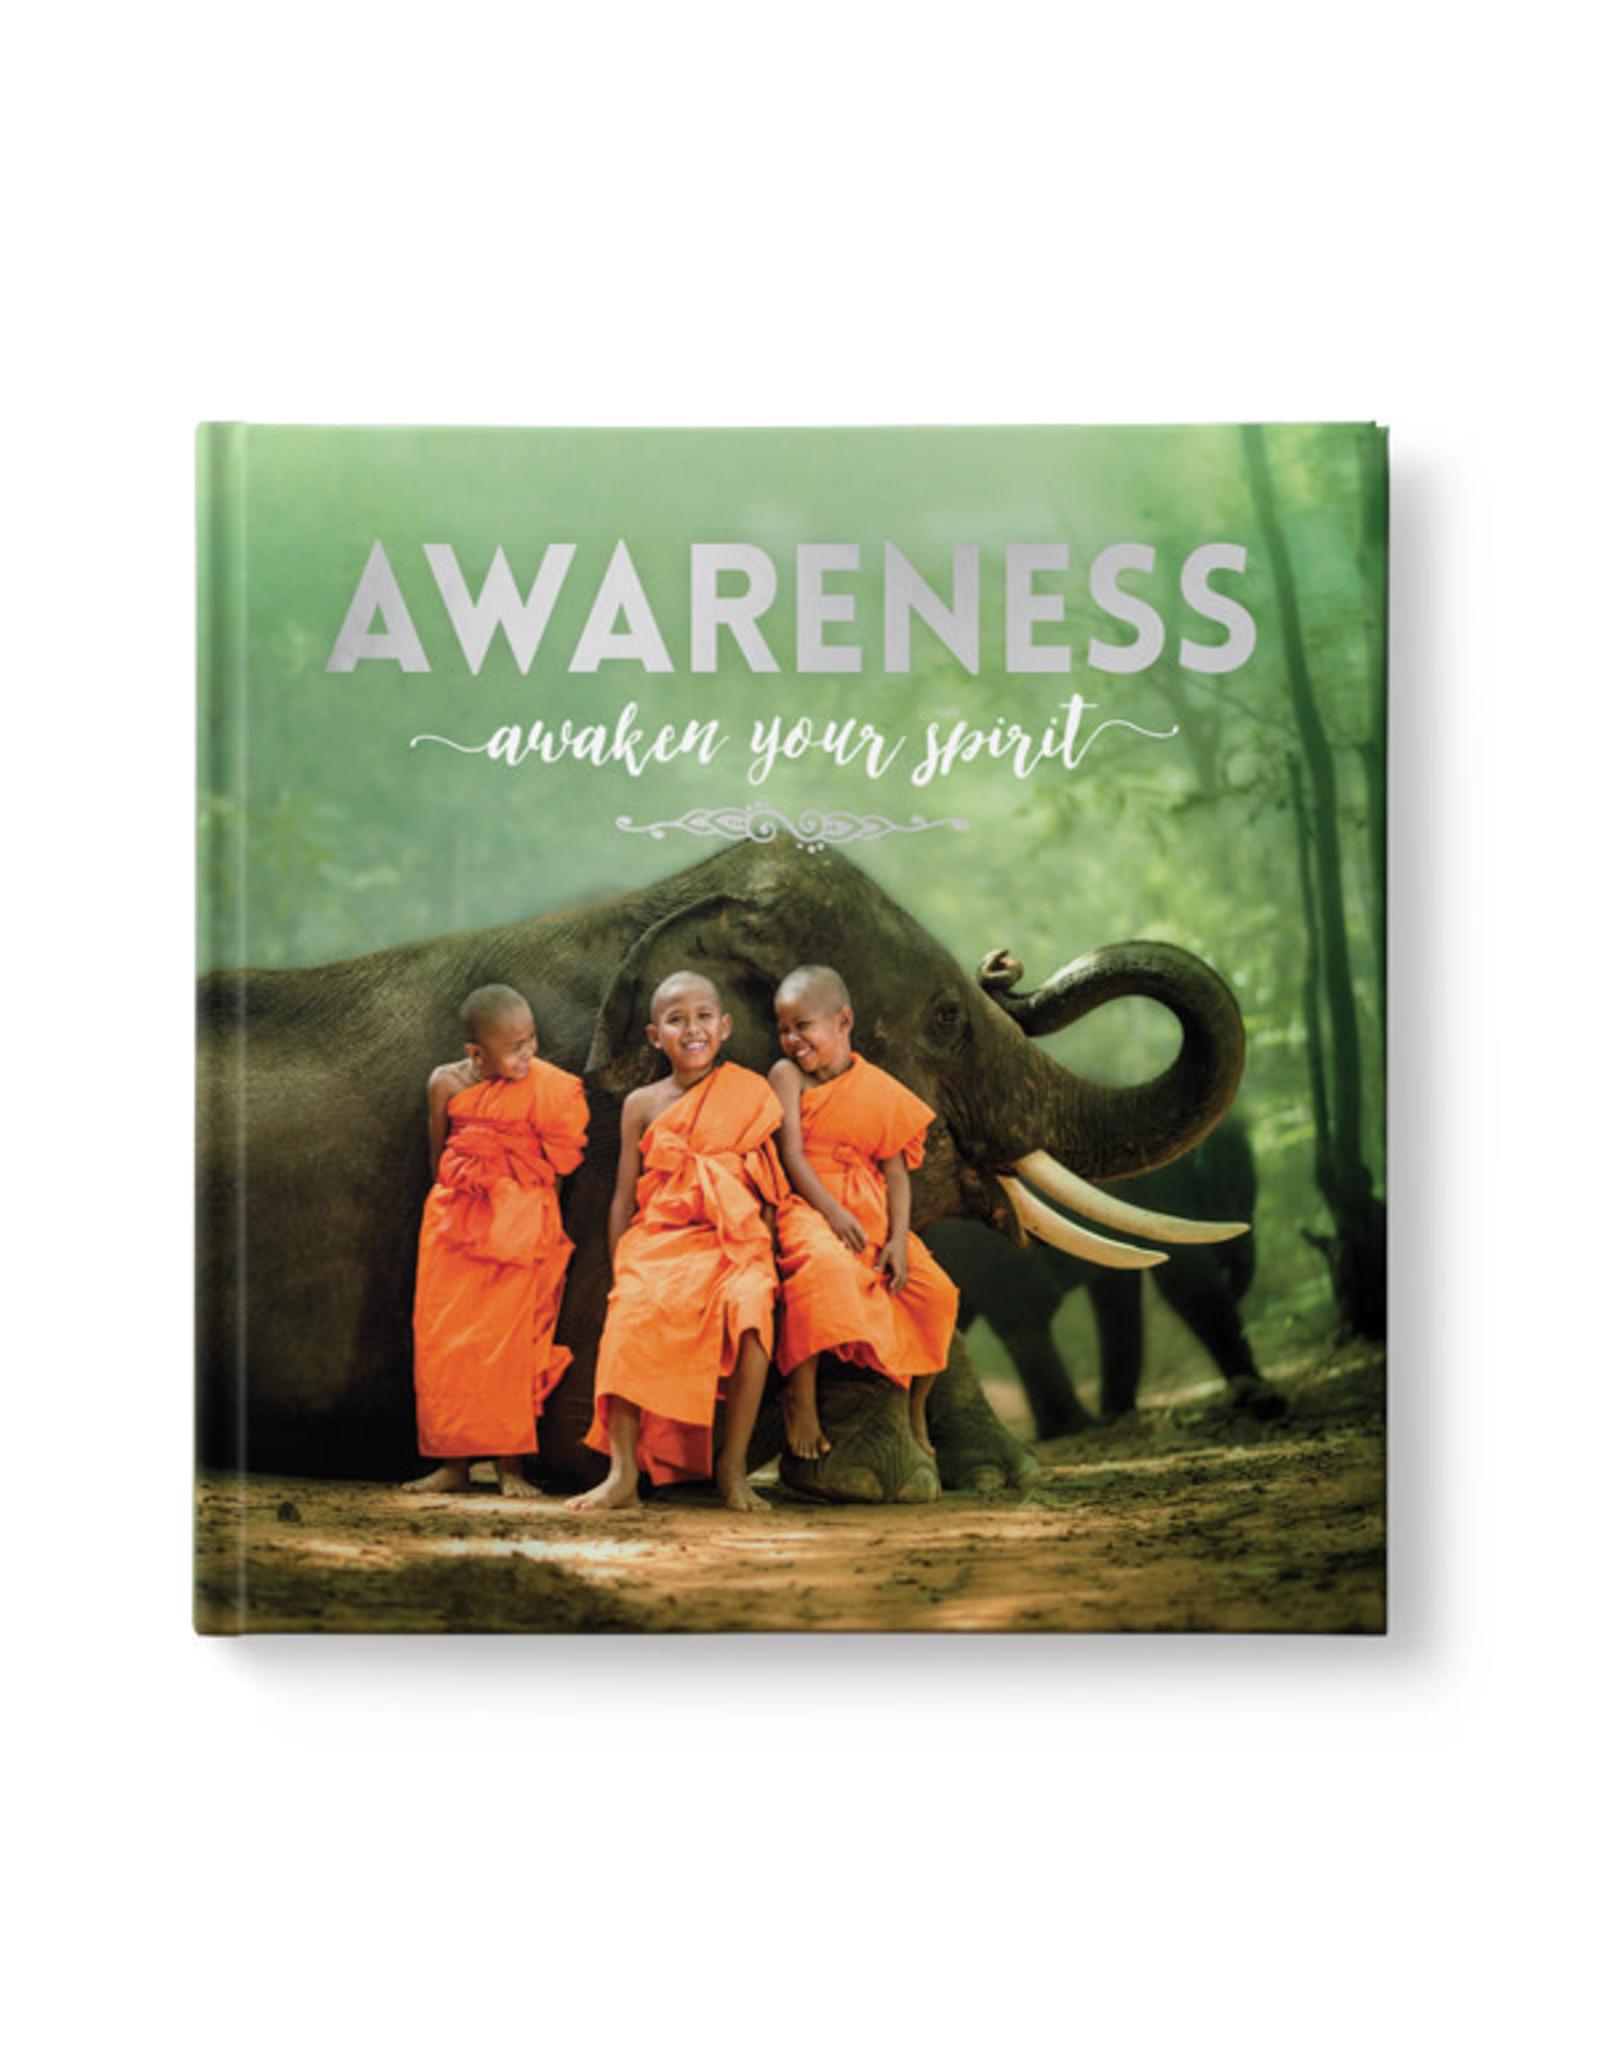 Affirmations Publishing House Awareness - Awaken Your Spirit